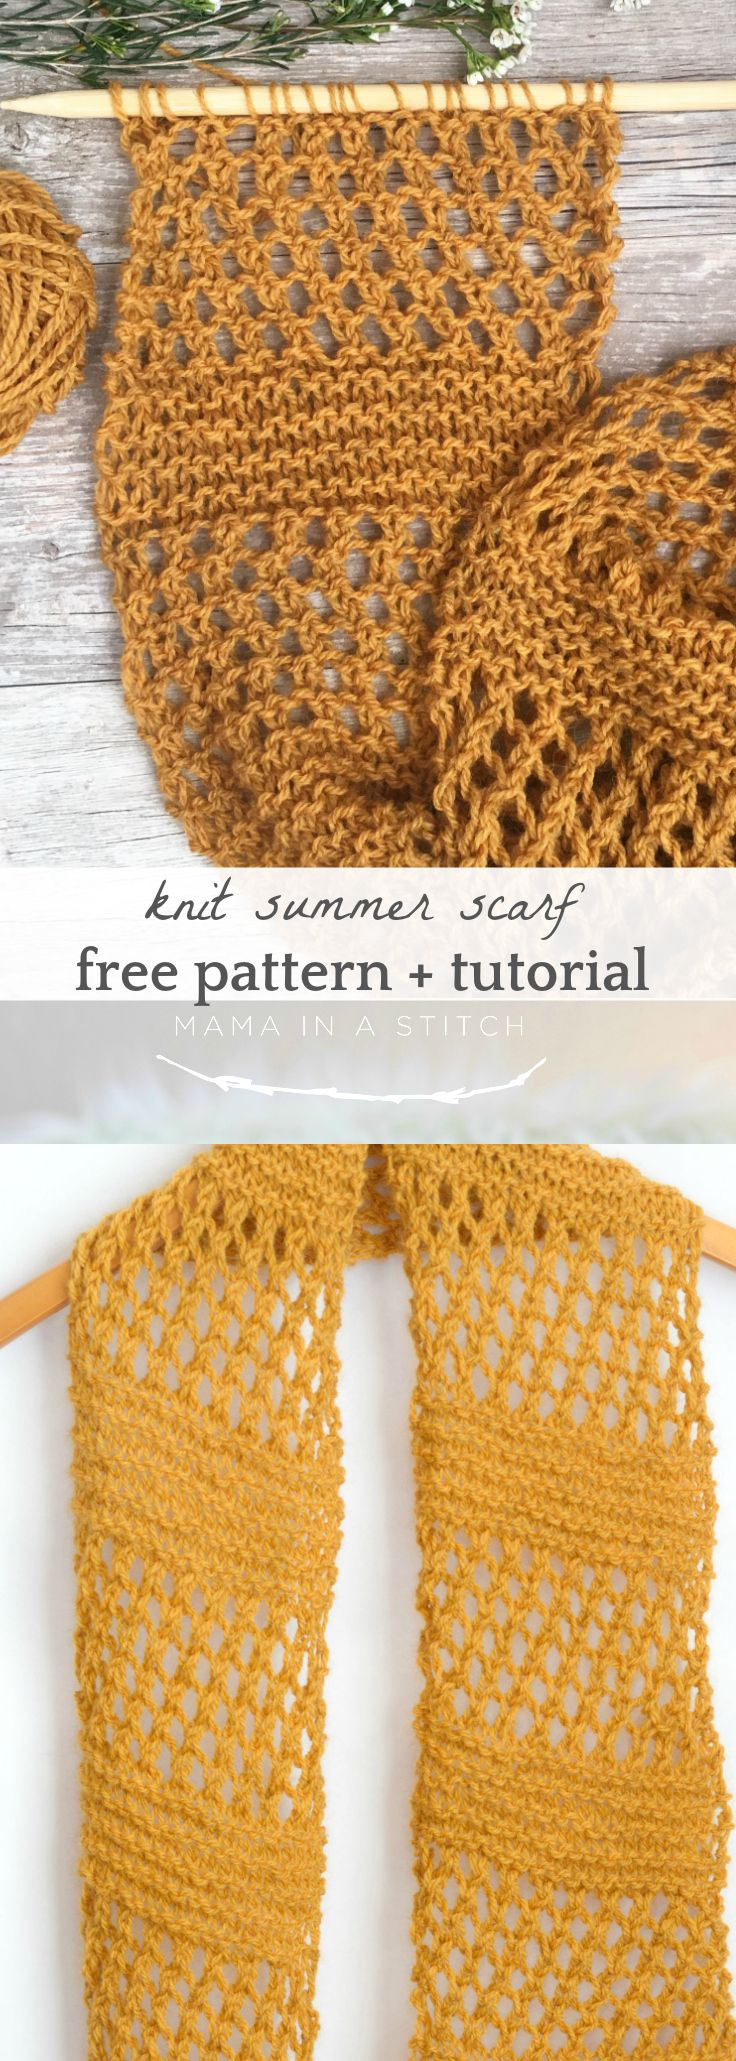 Honeycombs Summer Easy Scarf Knitting Pattern Bufandas Hilados